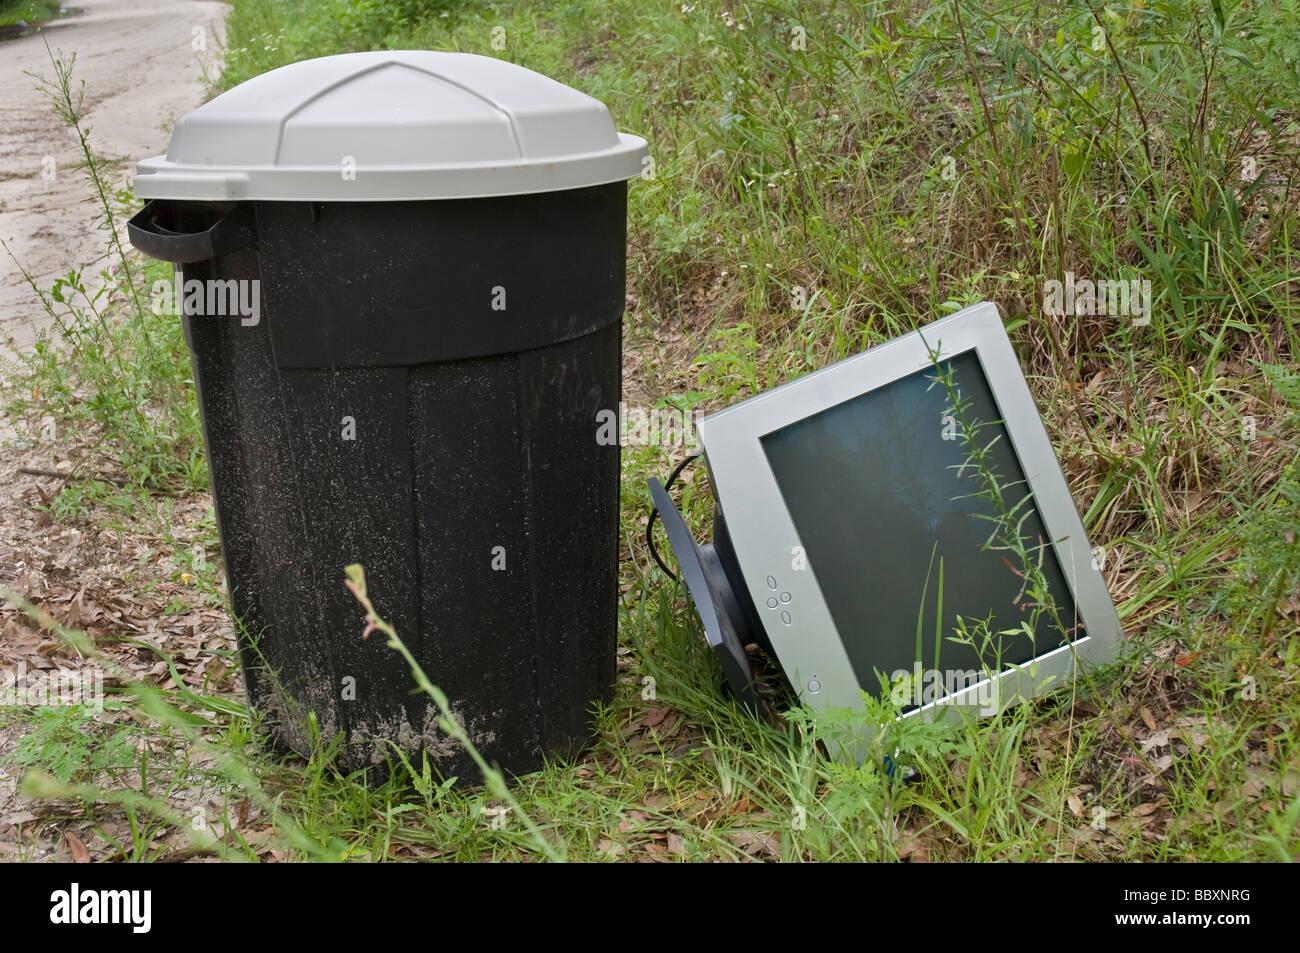 Computers drain children&#39